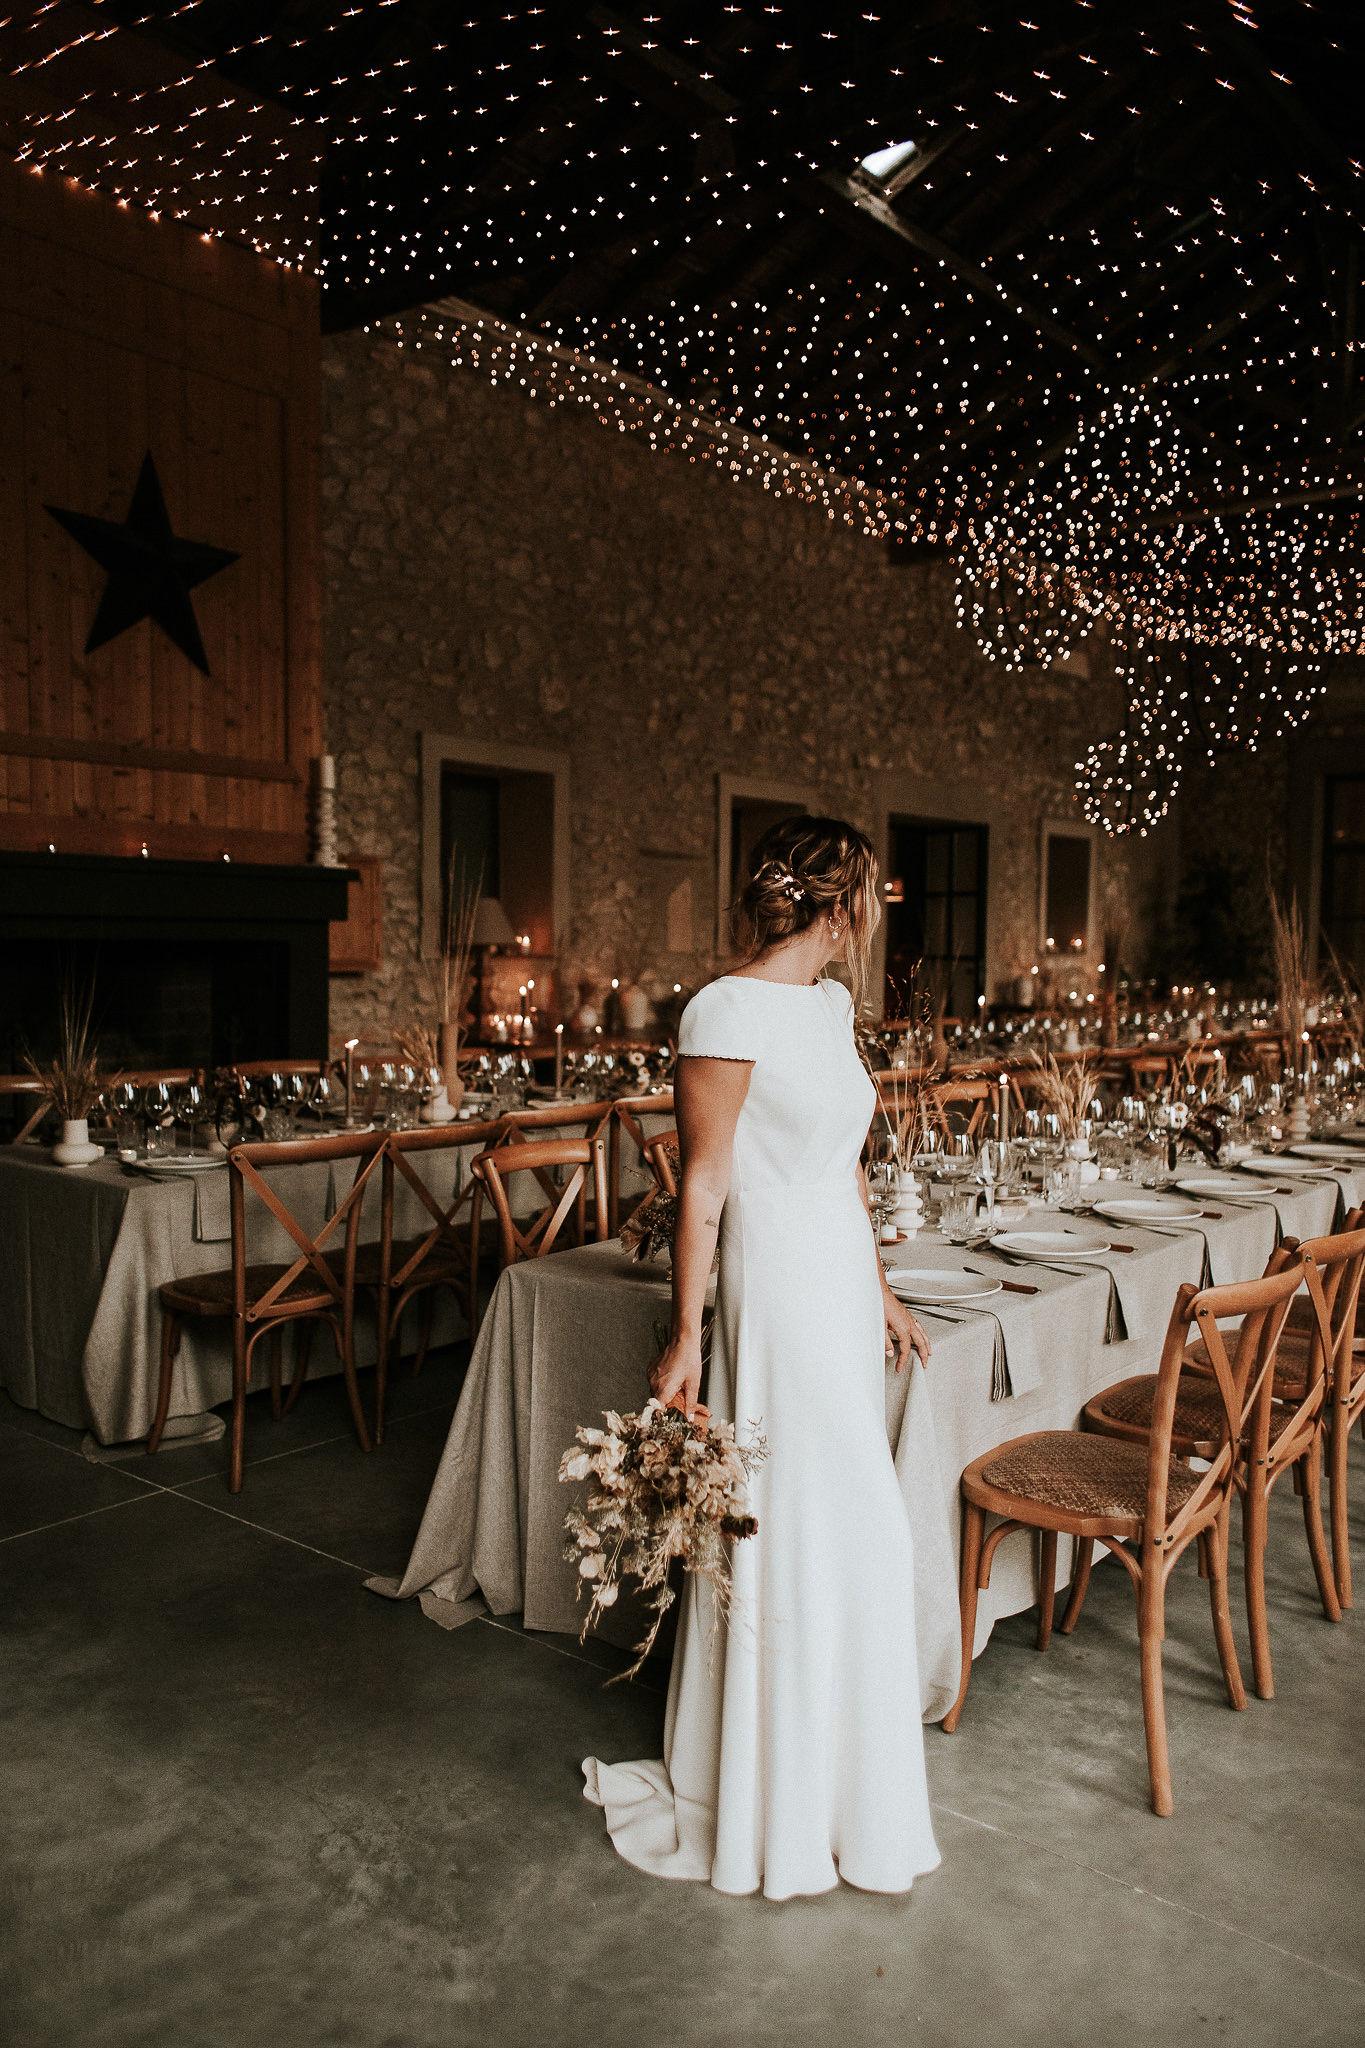 Lea_Felix_weddingpictures_small__706